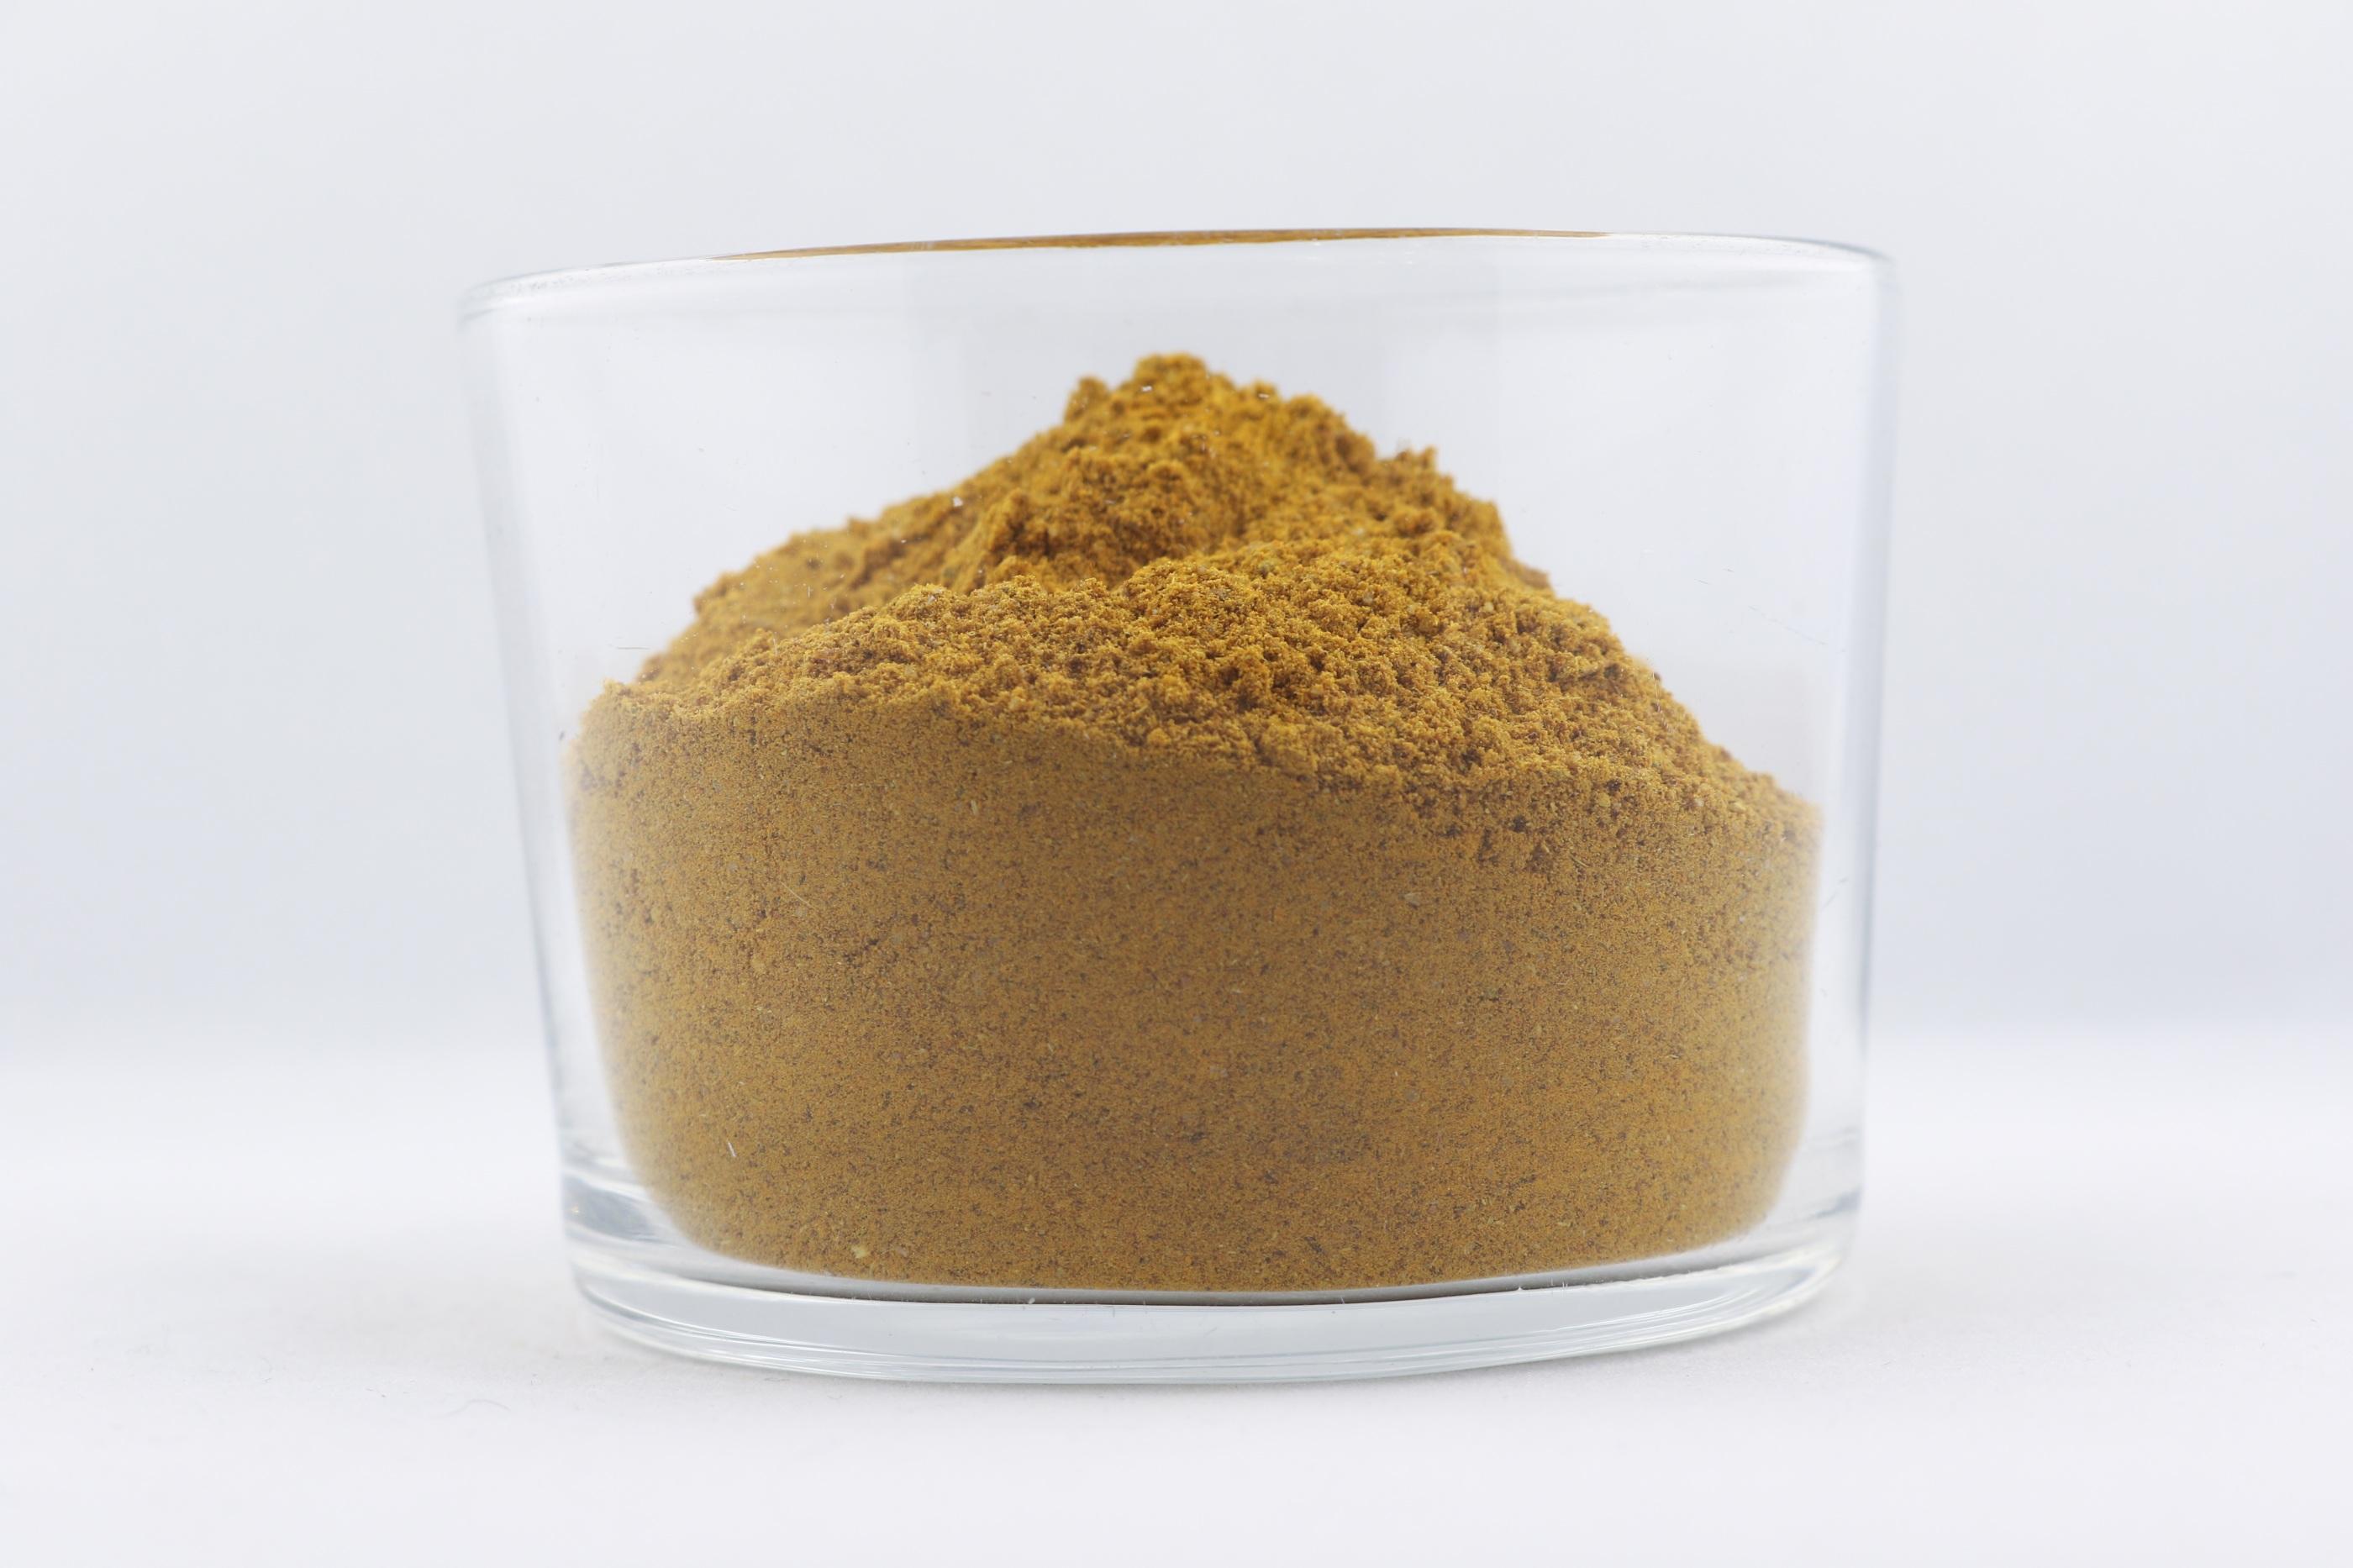 Kapha-Balans krydda kryddmix wellness ayurveda halmstad sweden svensk krydda kosttillskott lösvikt eko ekologisk